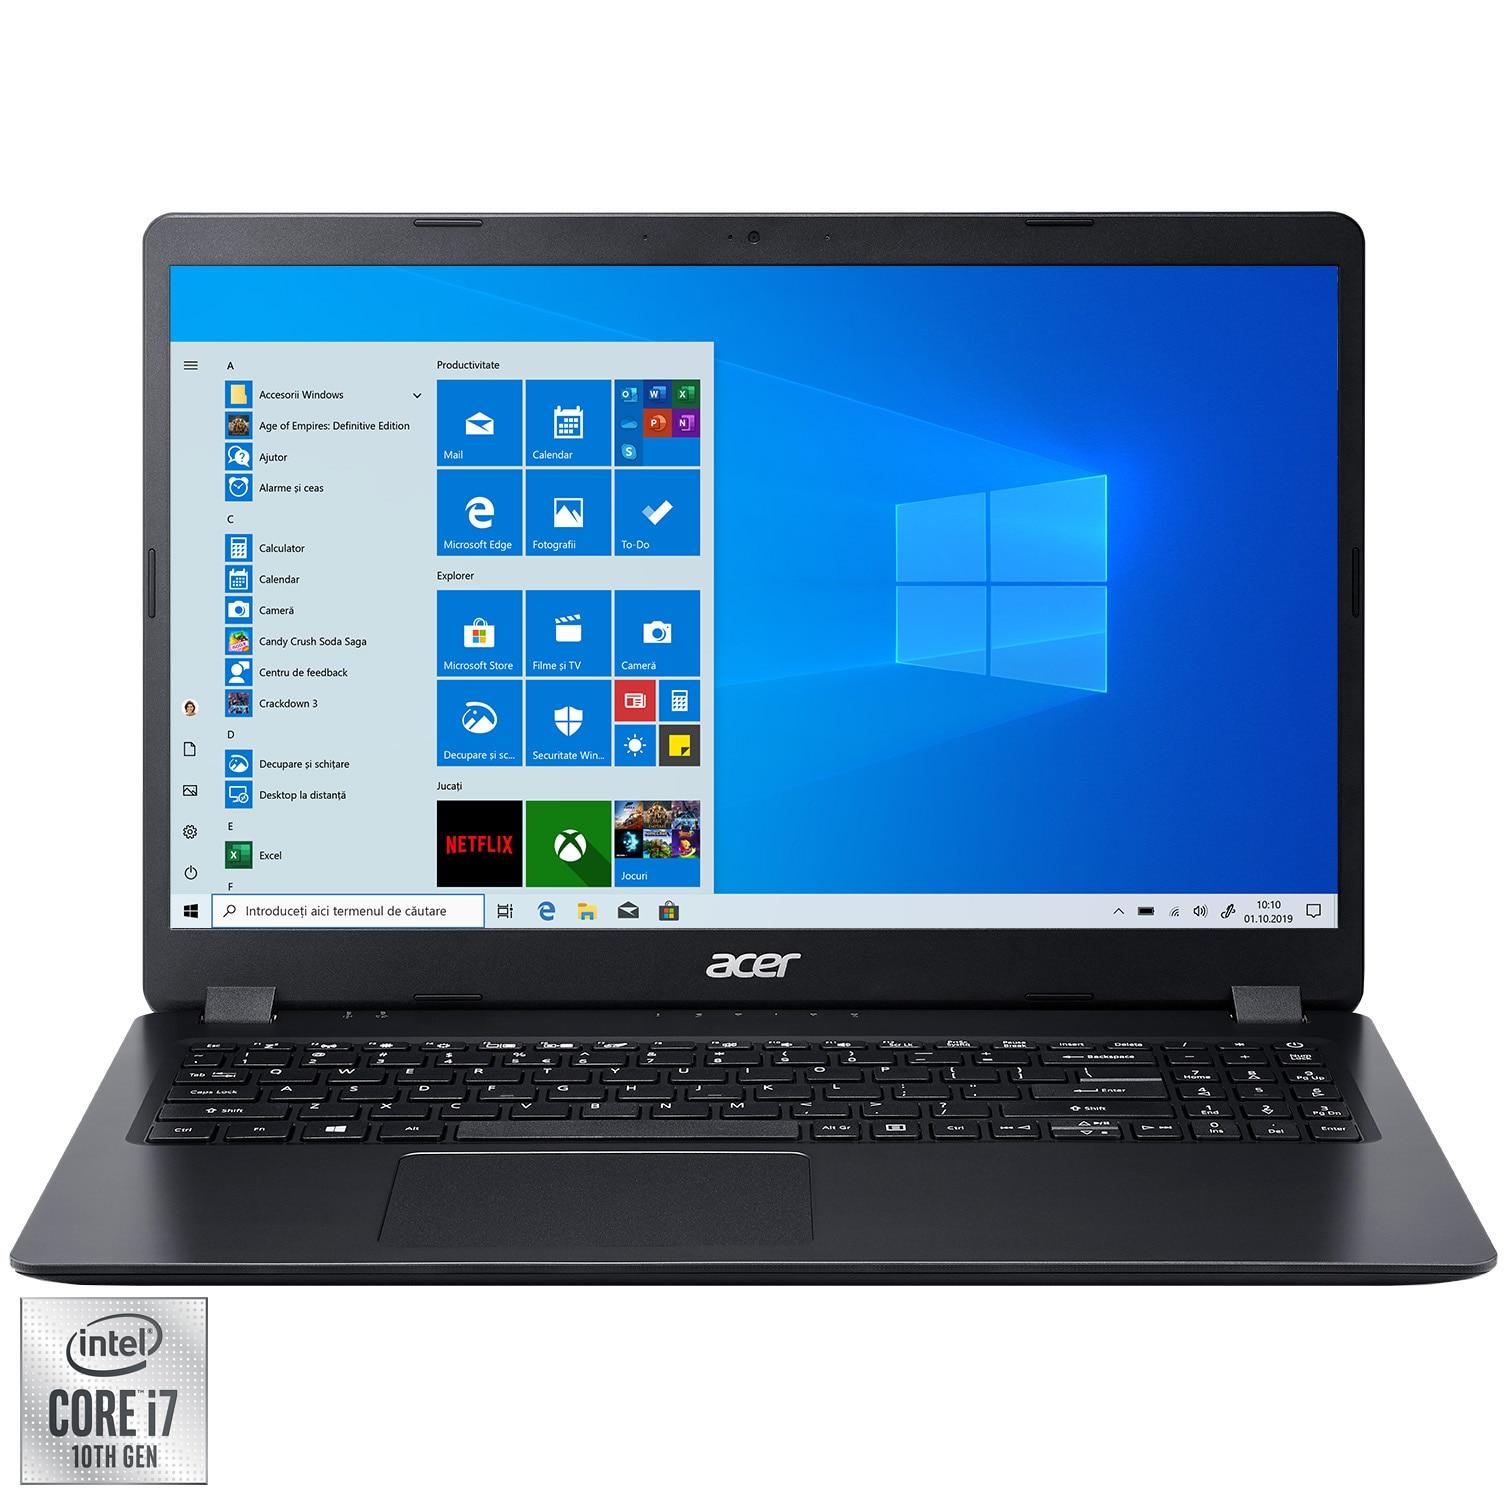 "Fotografie Laptop Acer Aspire 3 A315 cu procesor Intel Core i7-1065G7 pana la 3.90 GHz, 15.6"", Full HD, 8GB, 1TB SSD, Intel Iris Plus Graphics, Windows 10 Home, Black"